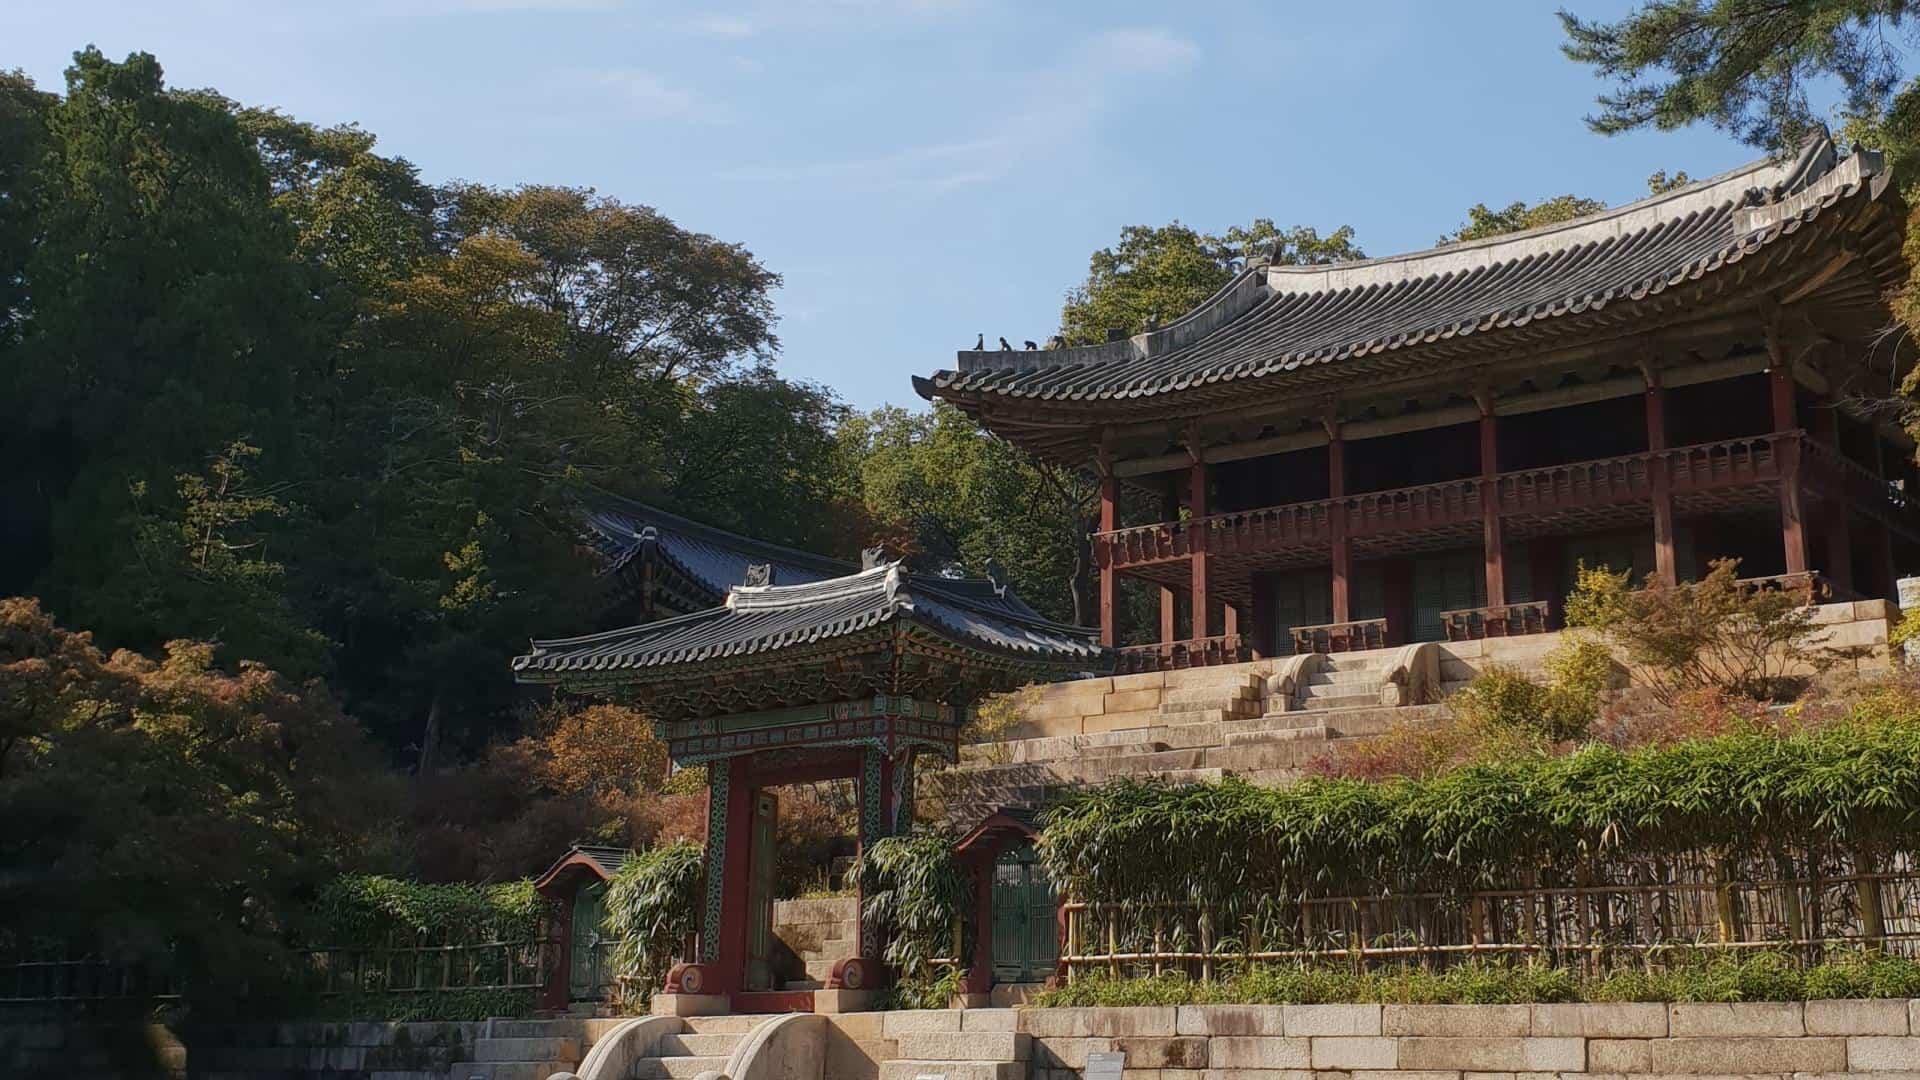 weinblog-asien-blick-auf-tempel-secret-garden-seoul